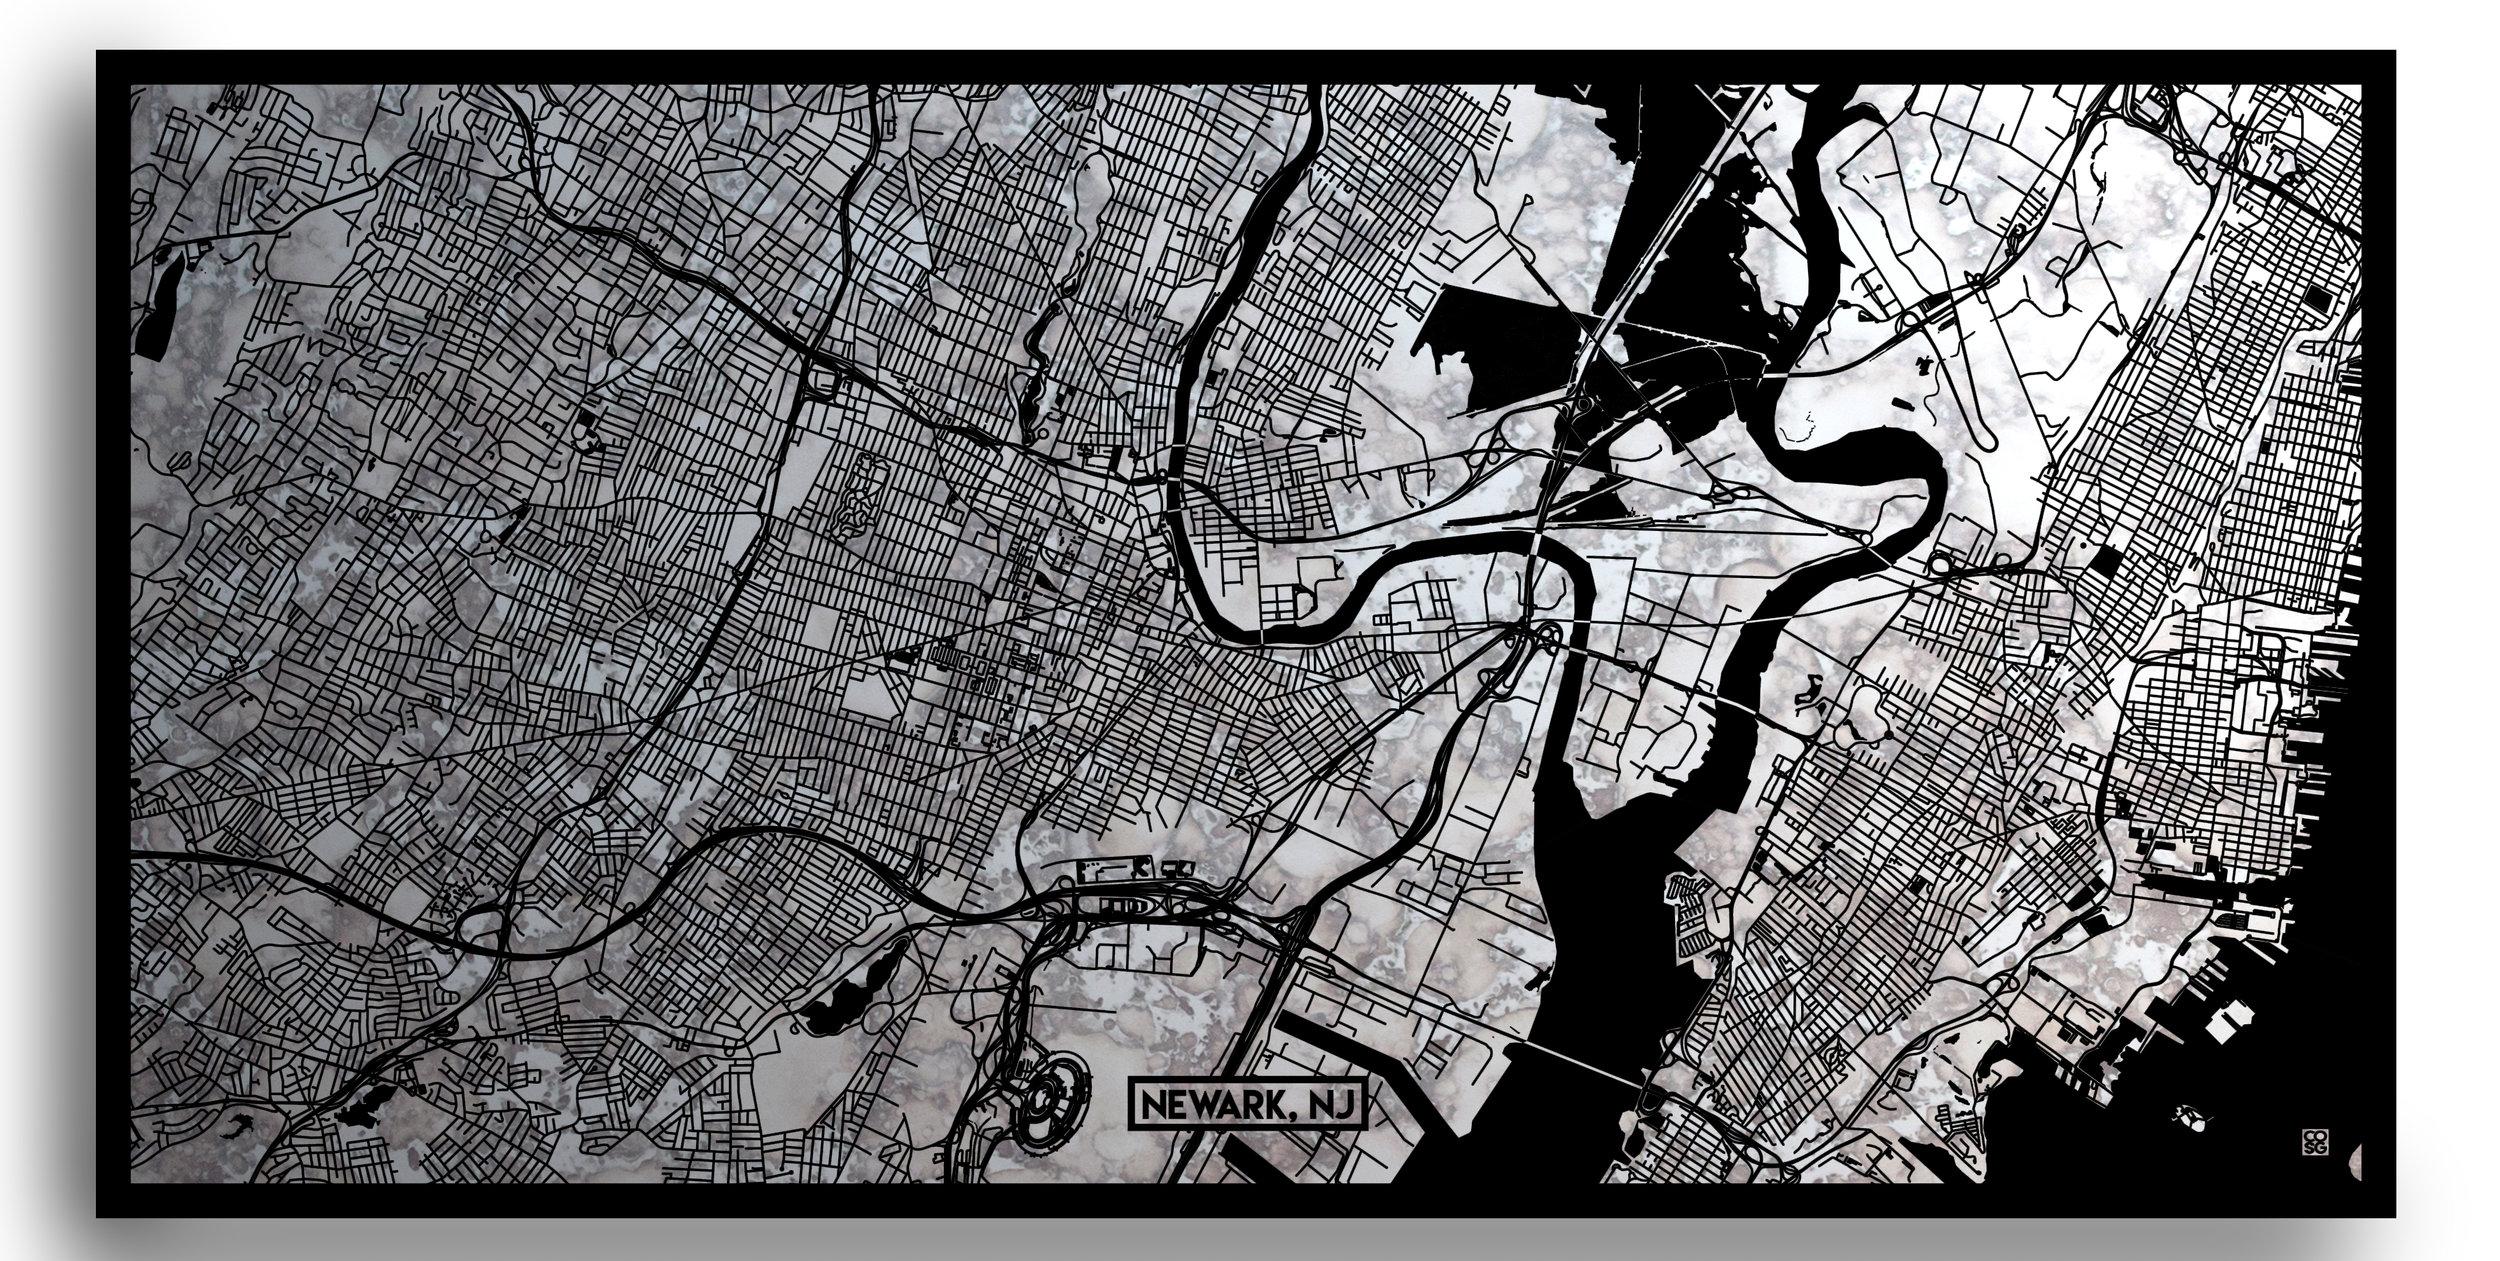 Newark_72x36.jpg